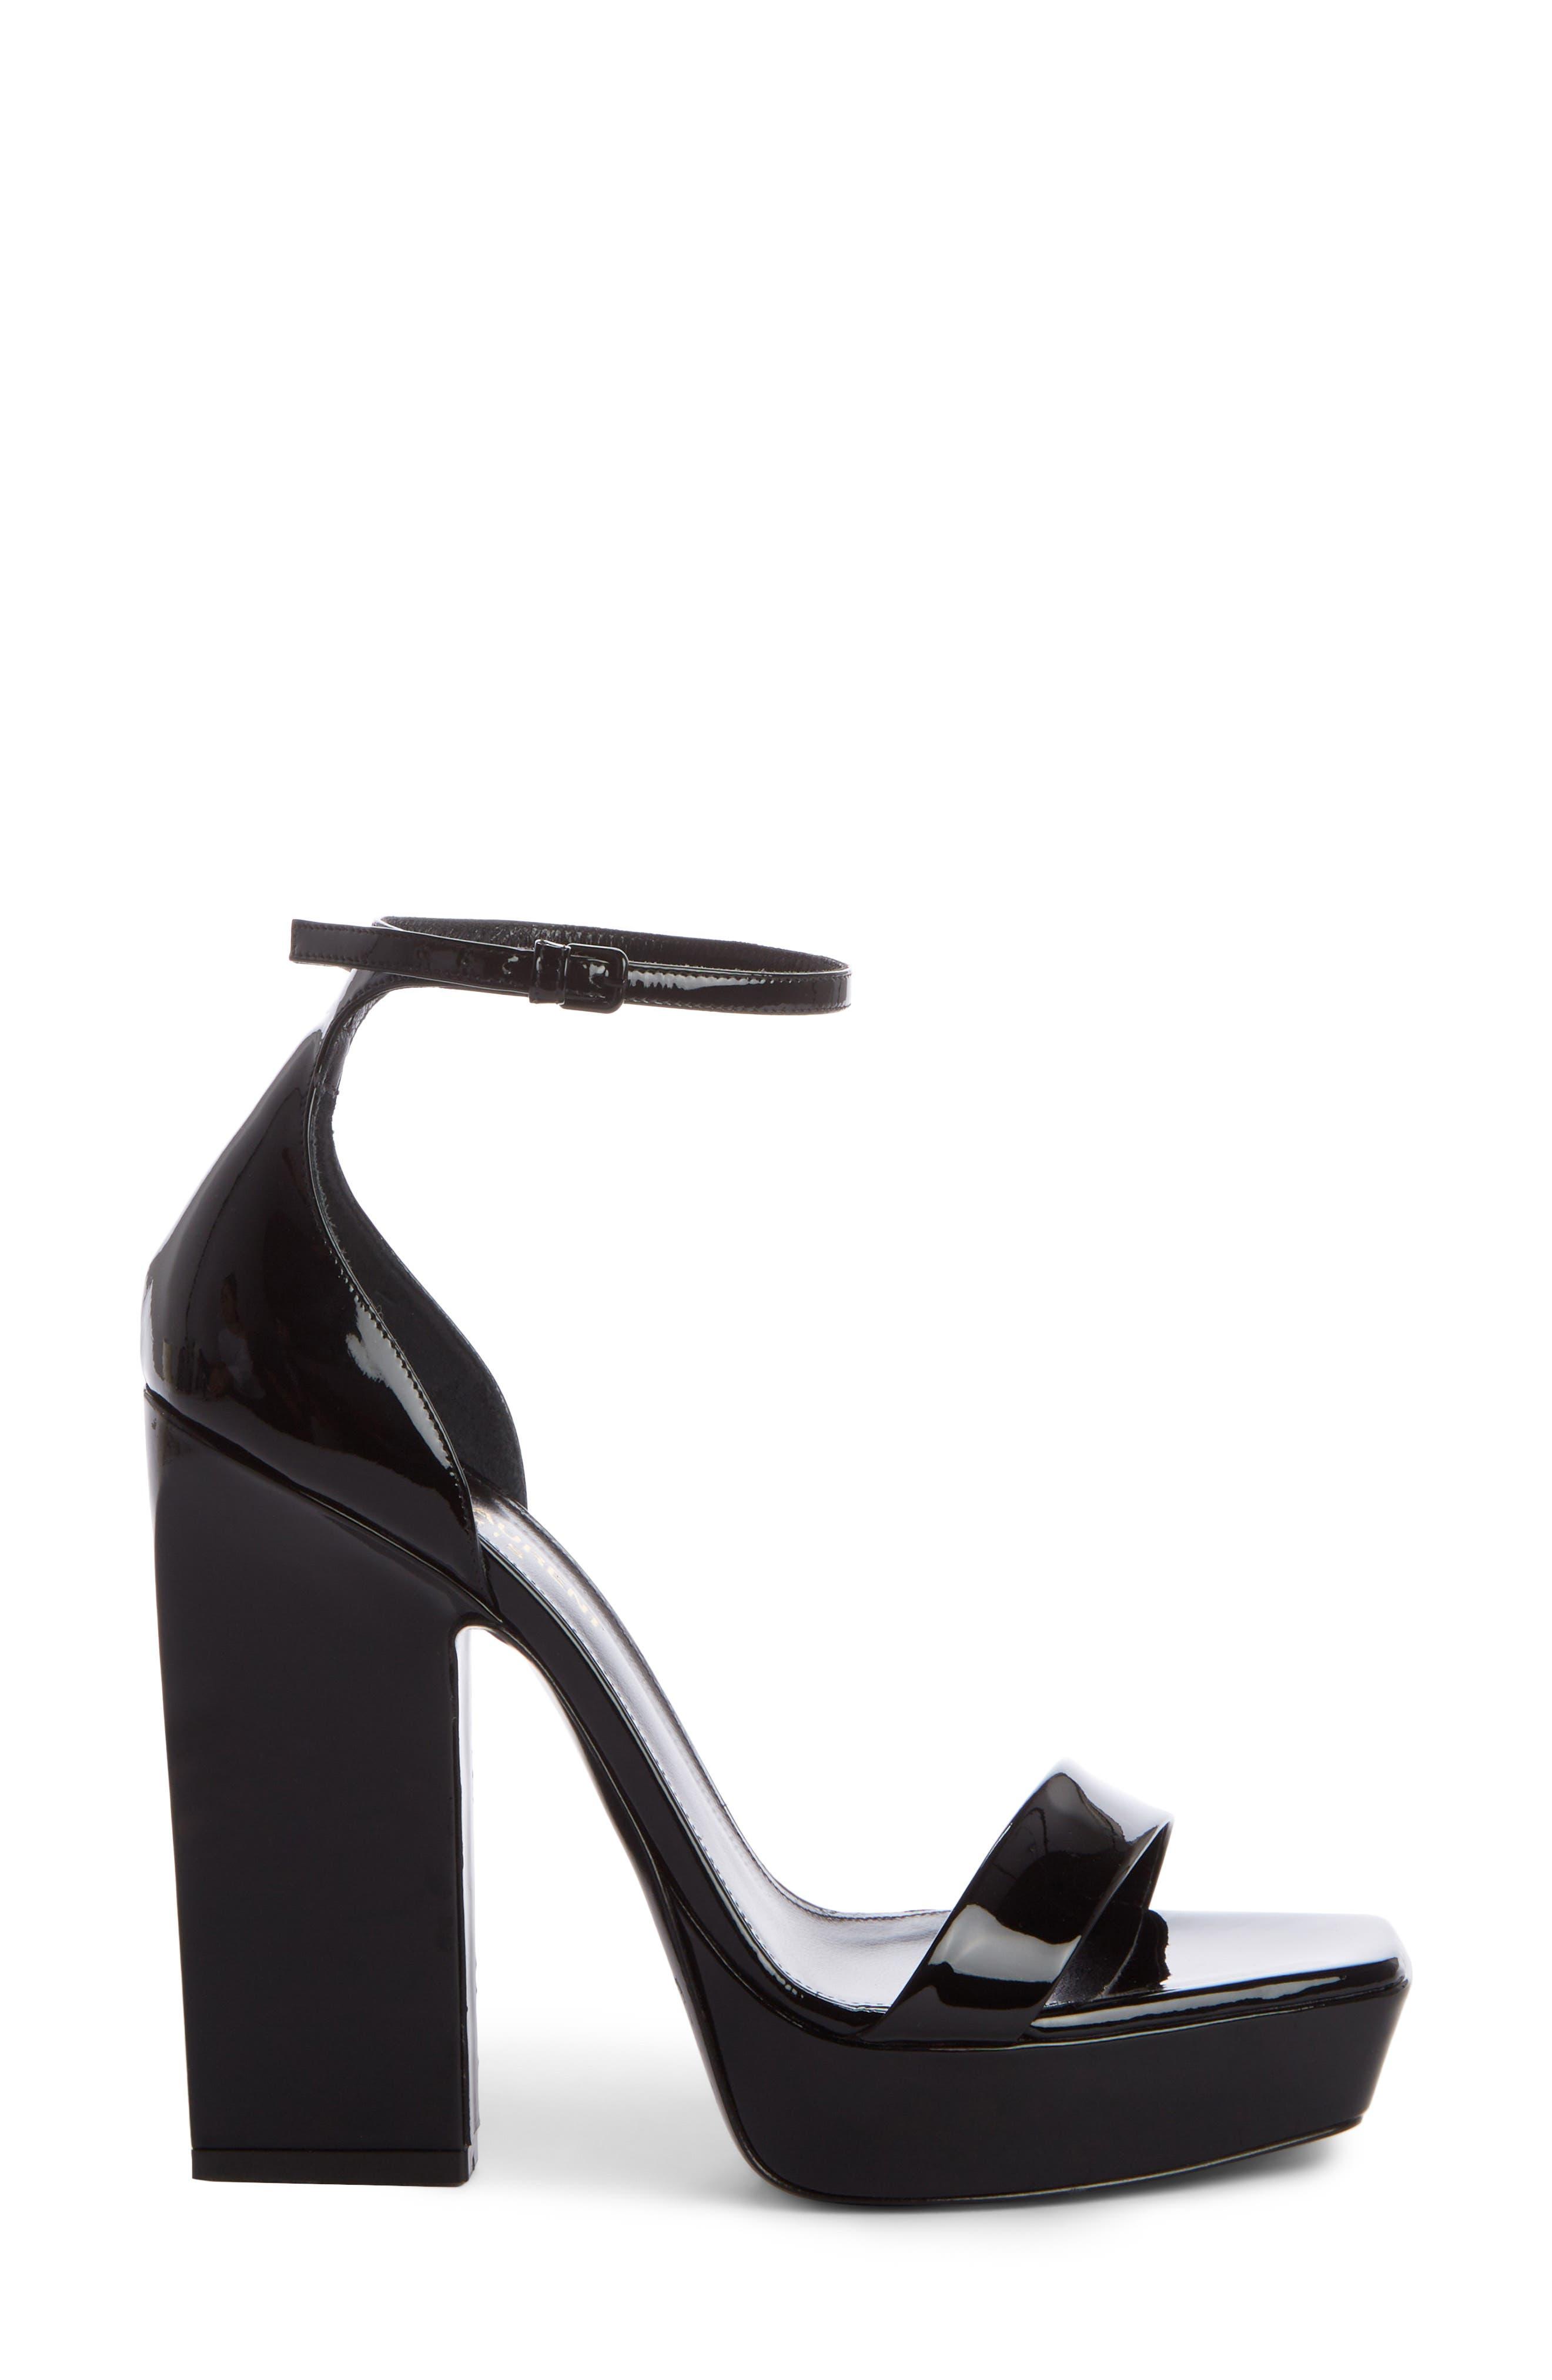 Debbie Platform Ankle Strap Sandal,                             Alternate thumbnail 4, color,                             Black